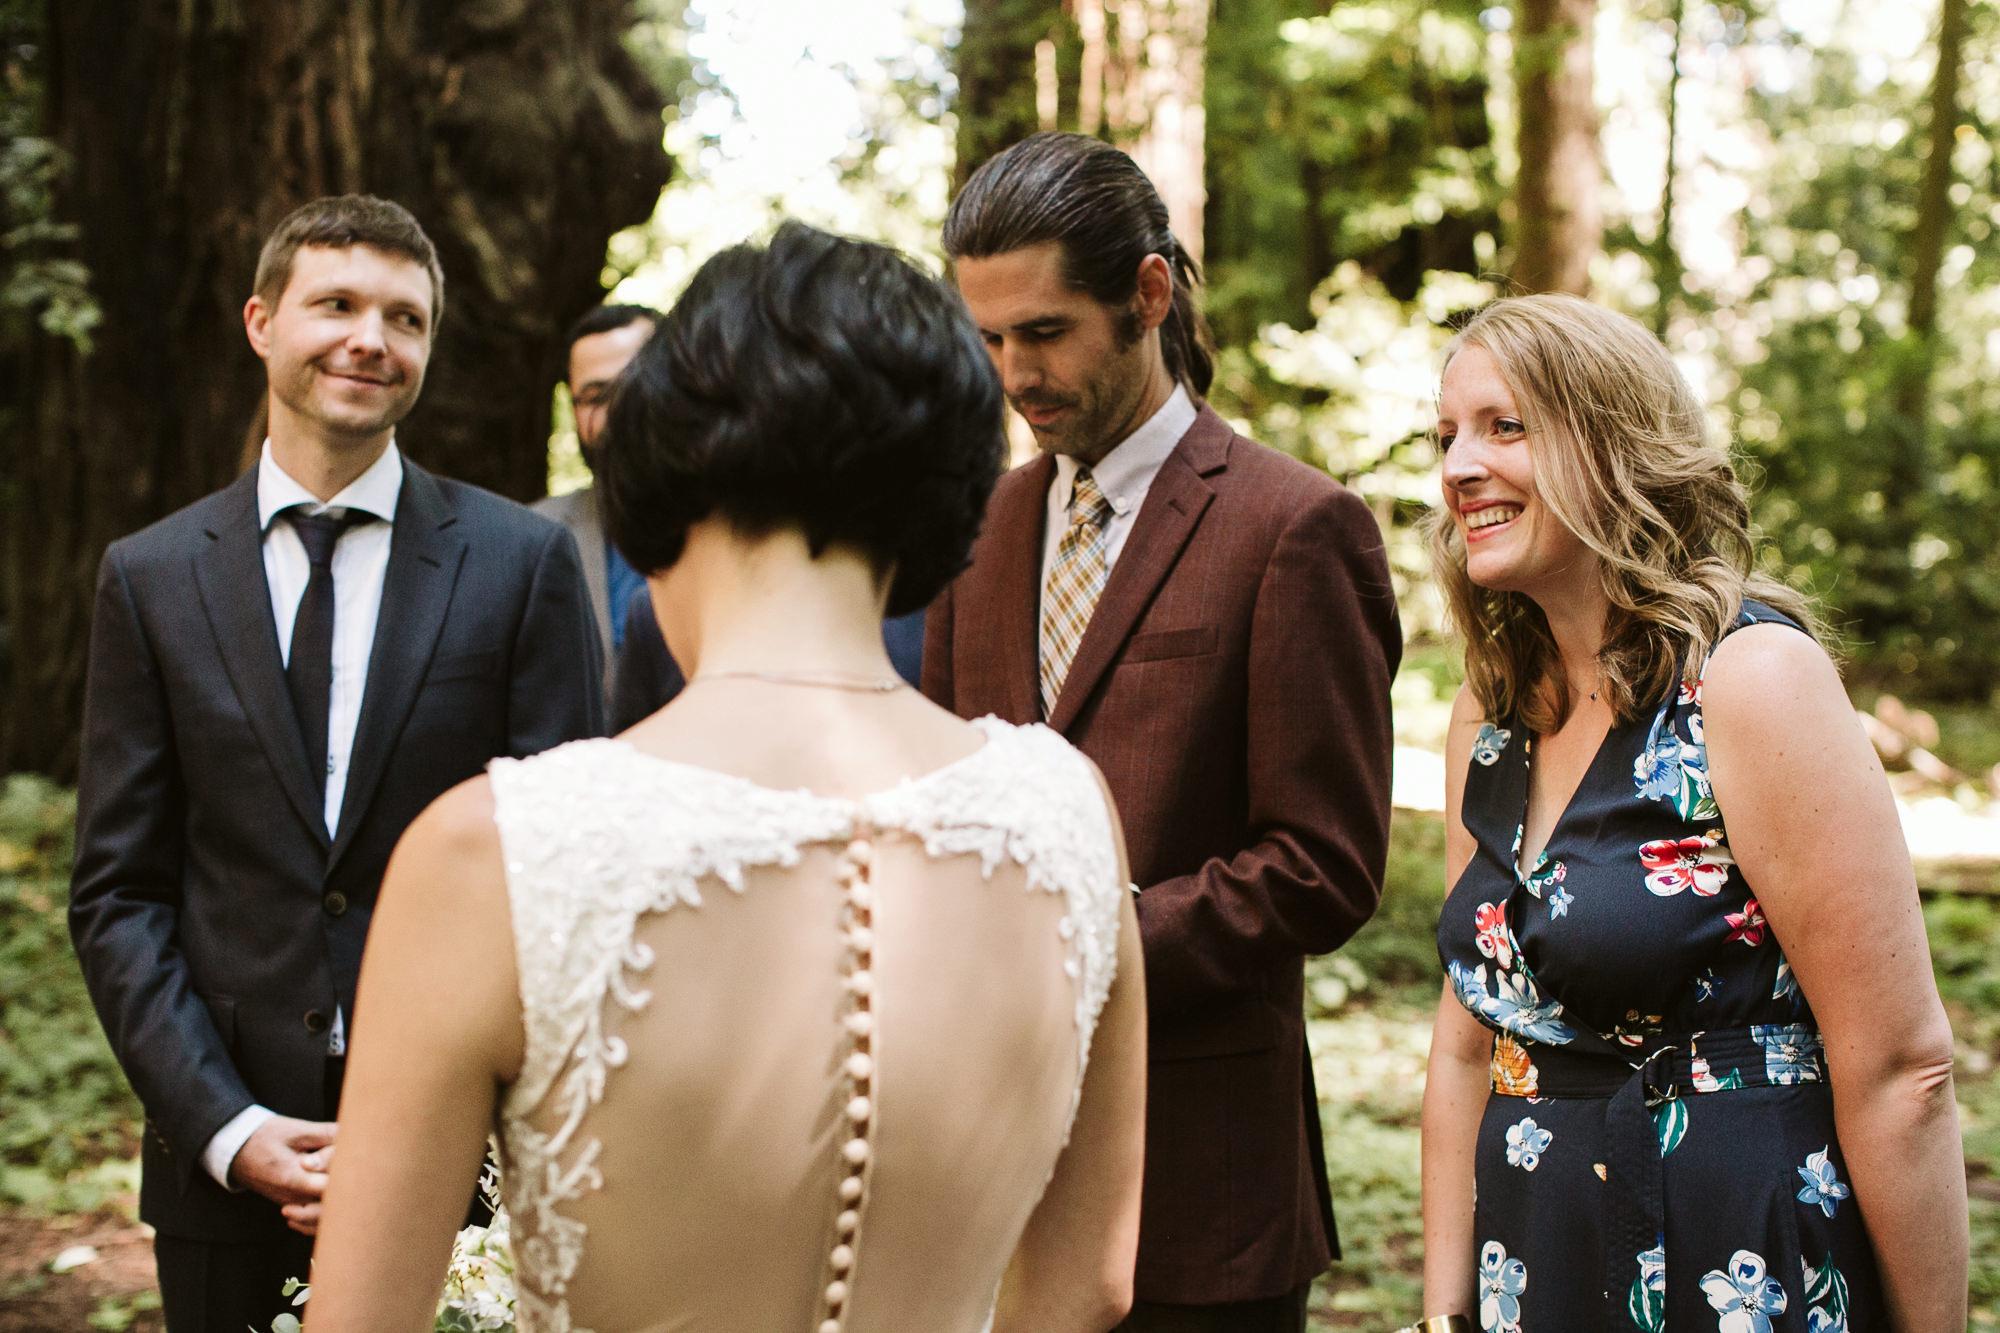 California-wedding-photographer-alfonso-flores-pamplin-groove-180.jpg